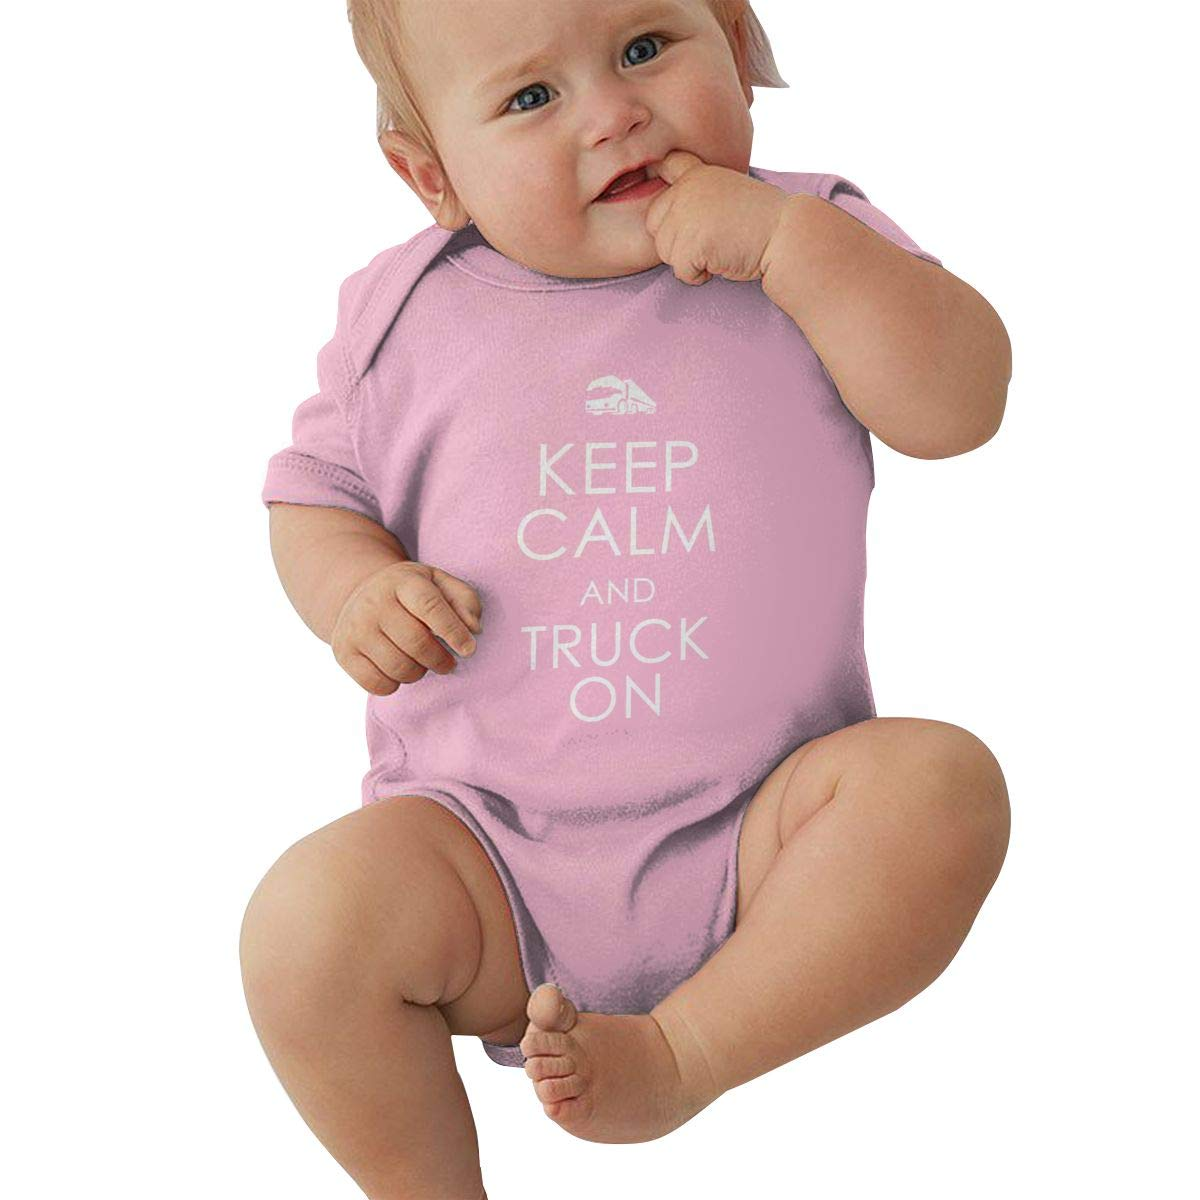 Newborn Baby Girls Bodysuit Short-Sleeve Onesie Keep Calm Truck On Print Jumpsuit